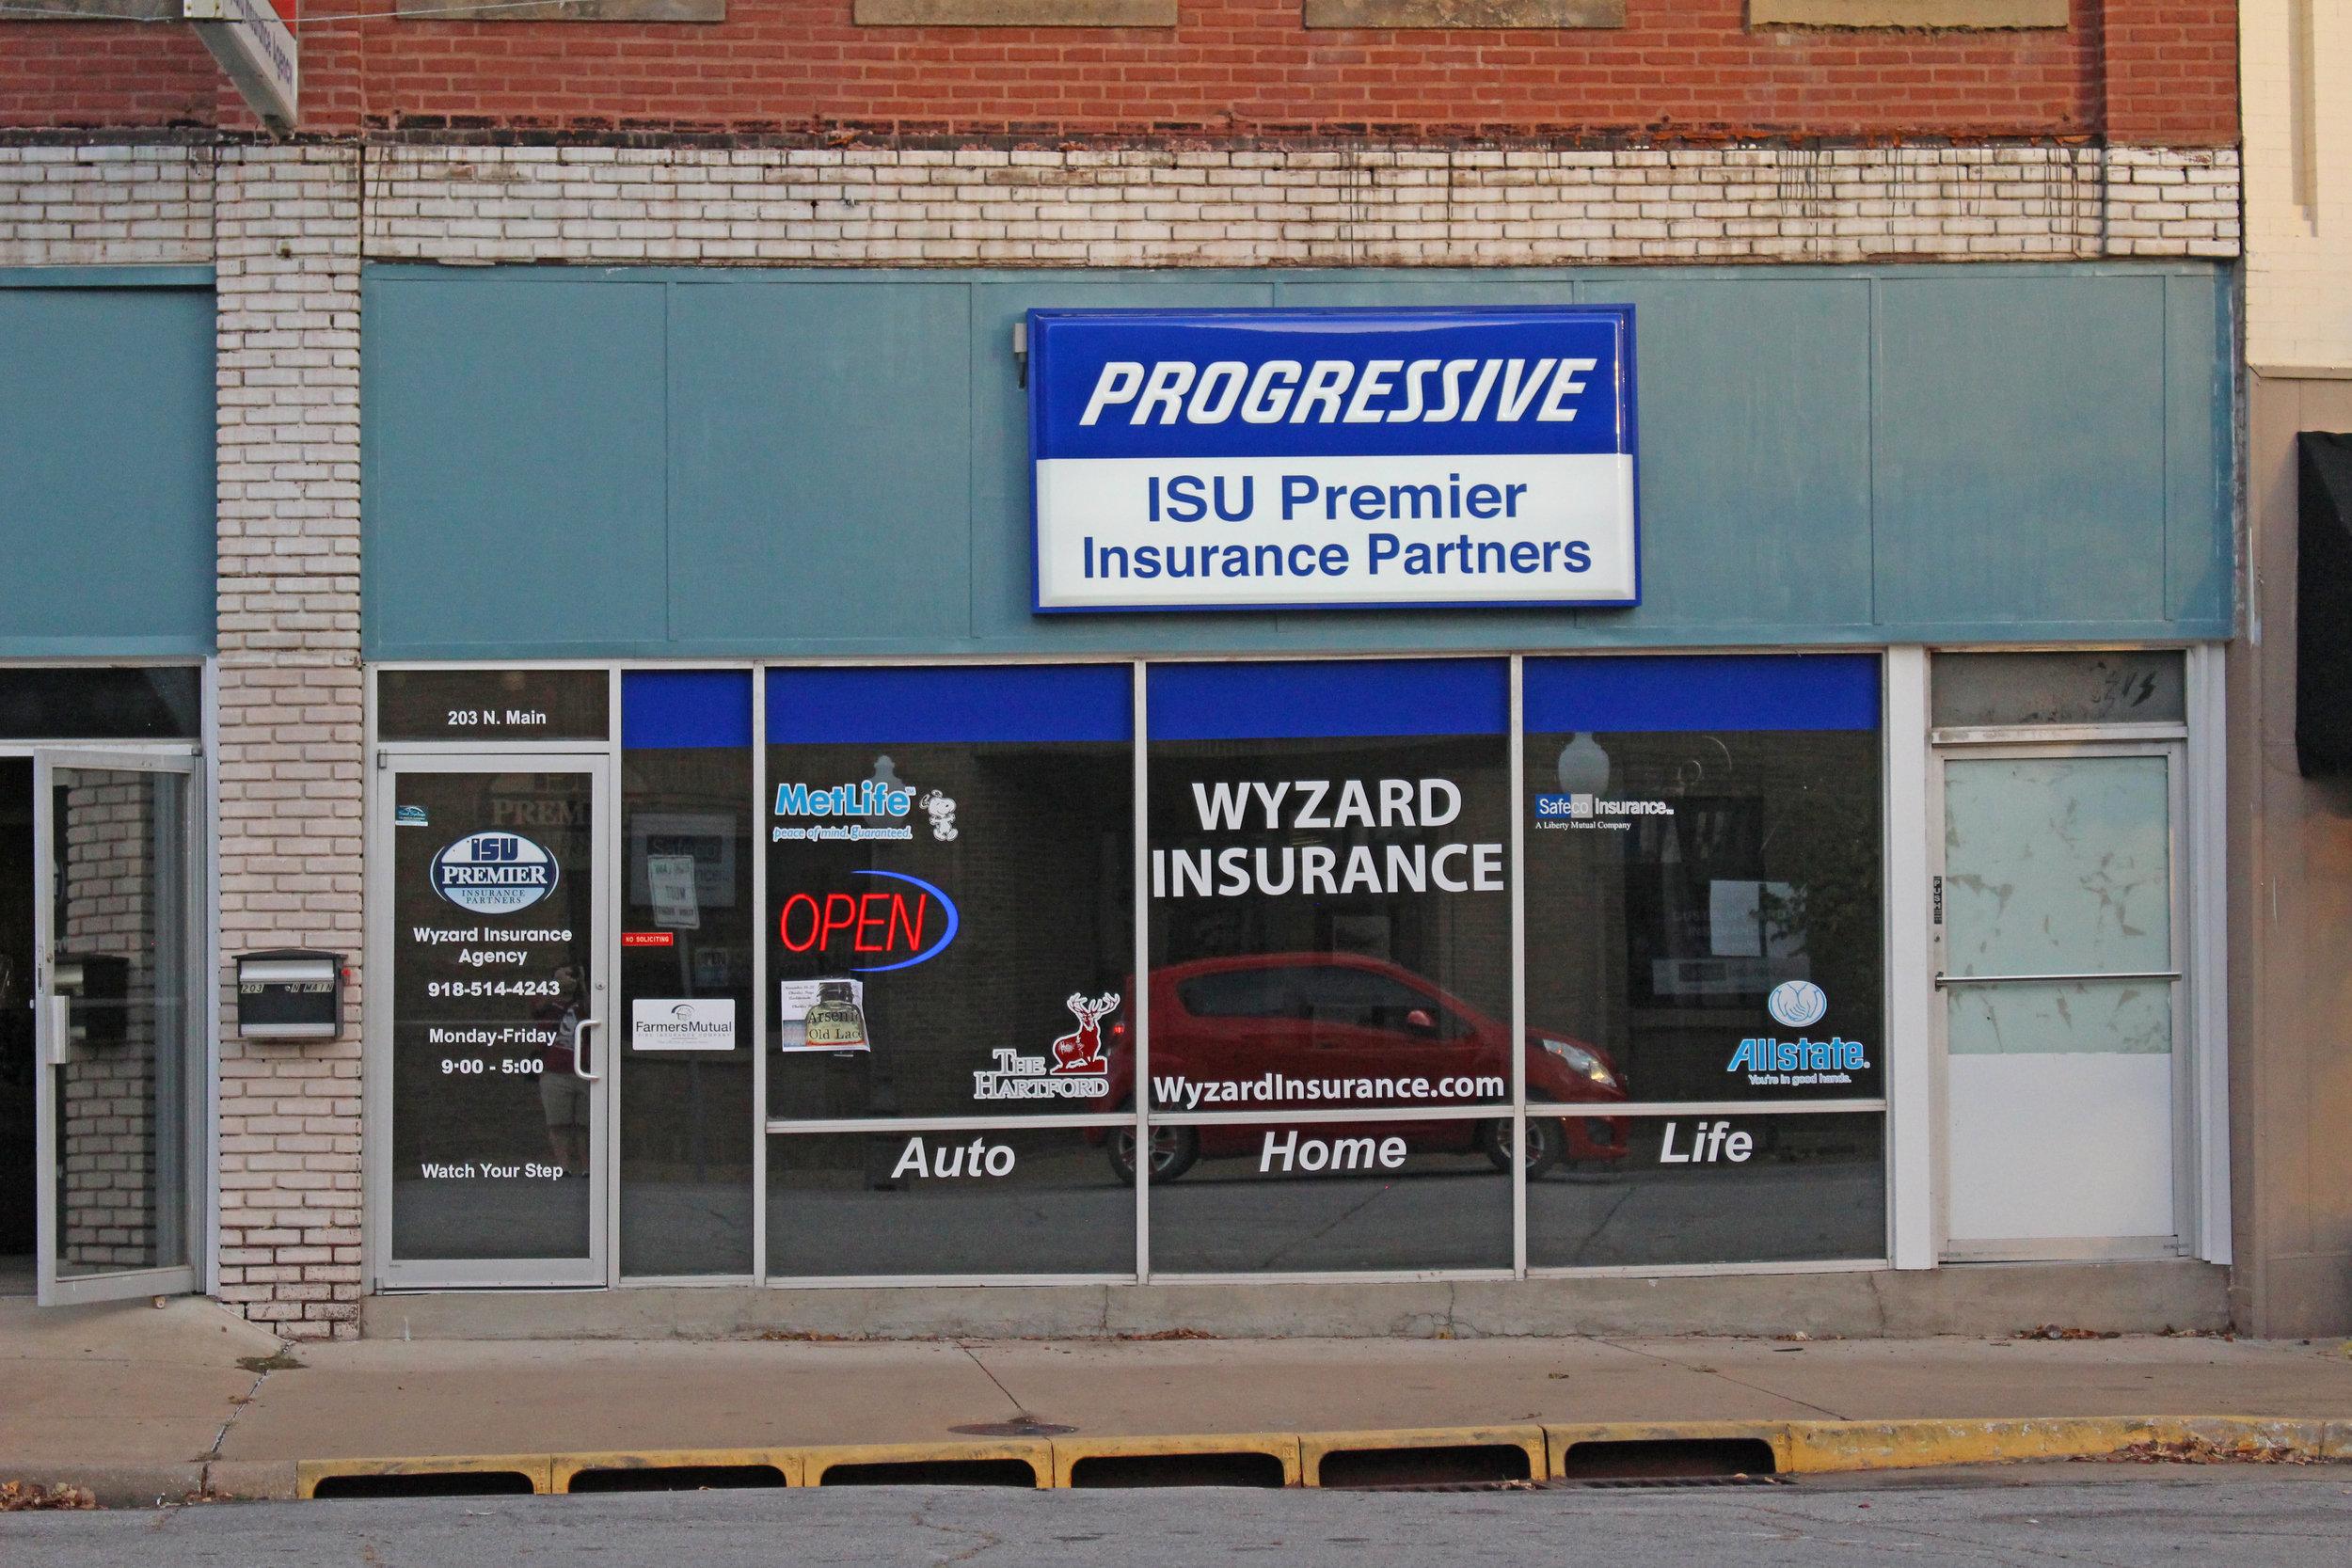 wyzard insurance - downtown 203 north main street